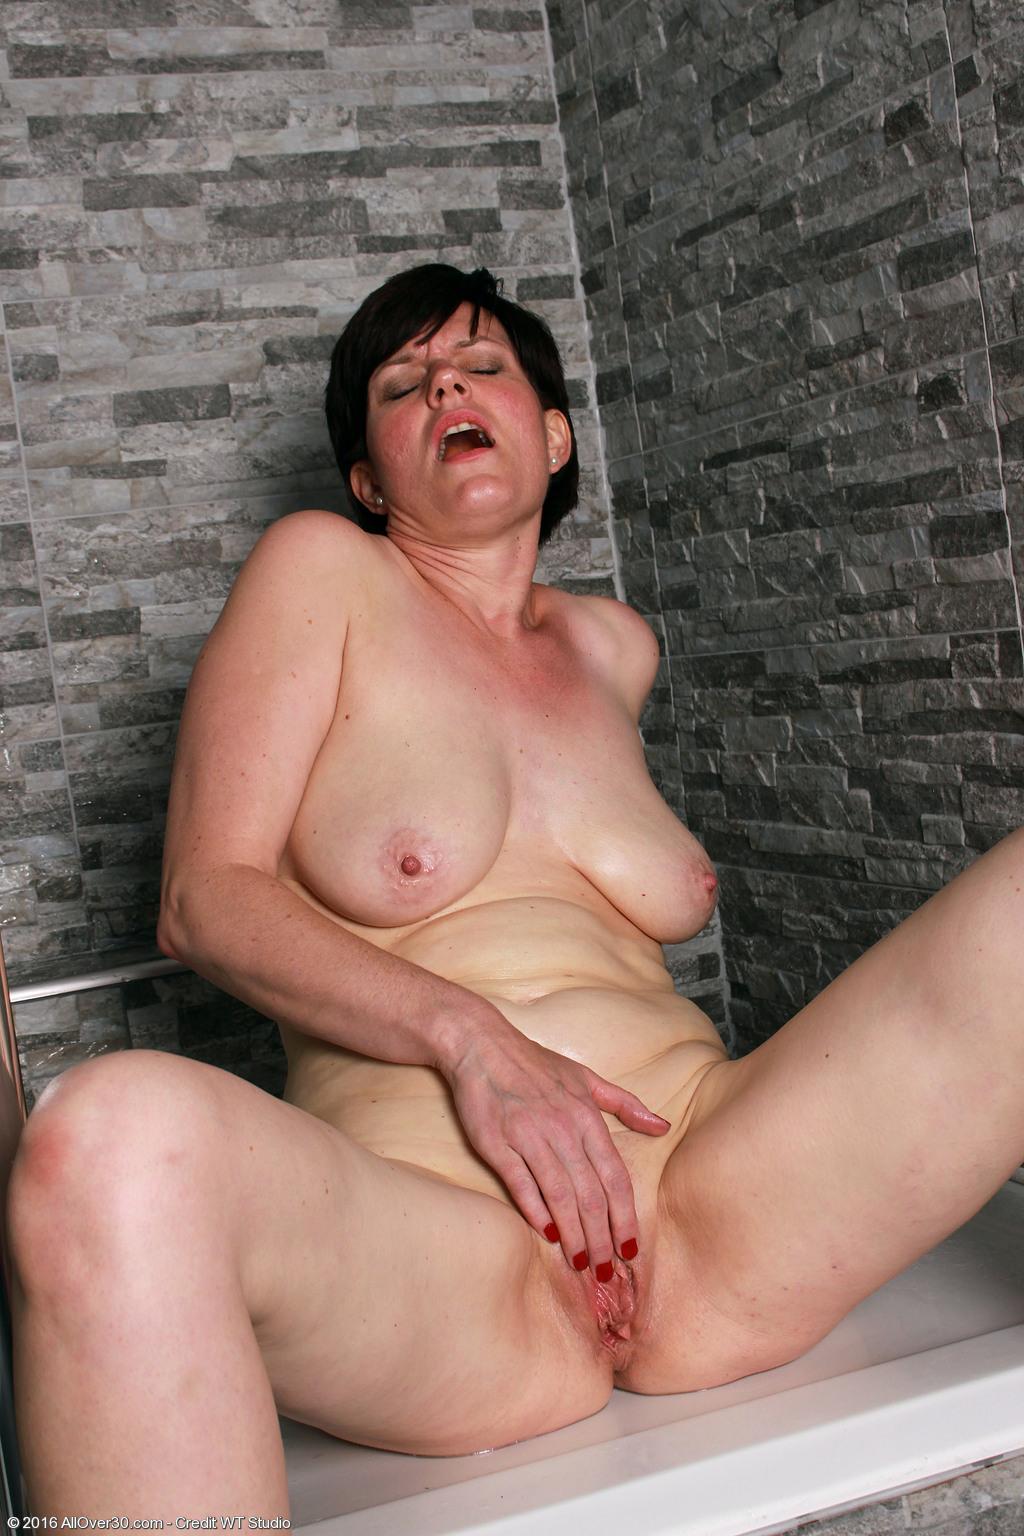 Itchy vagina no odor